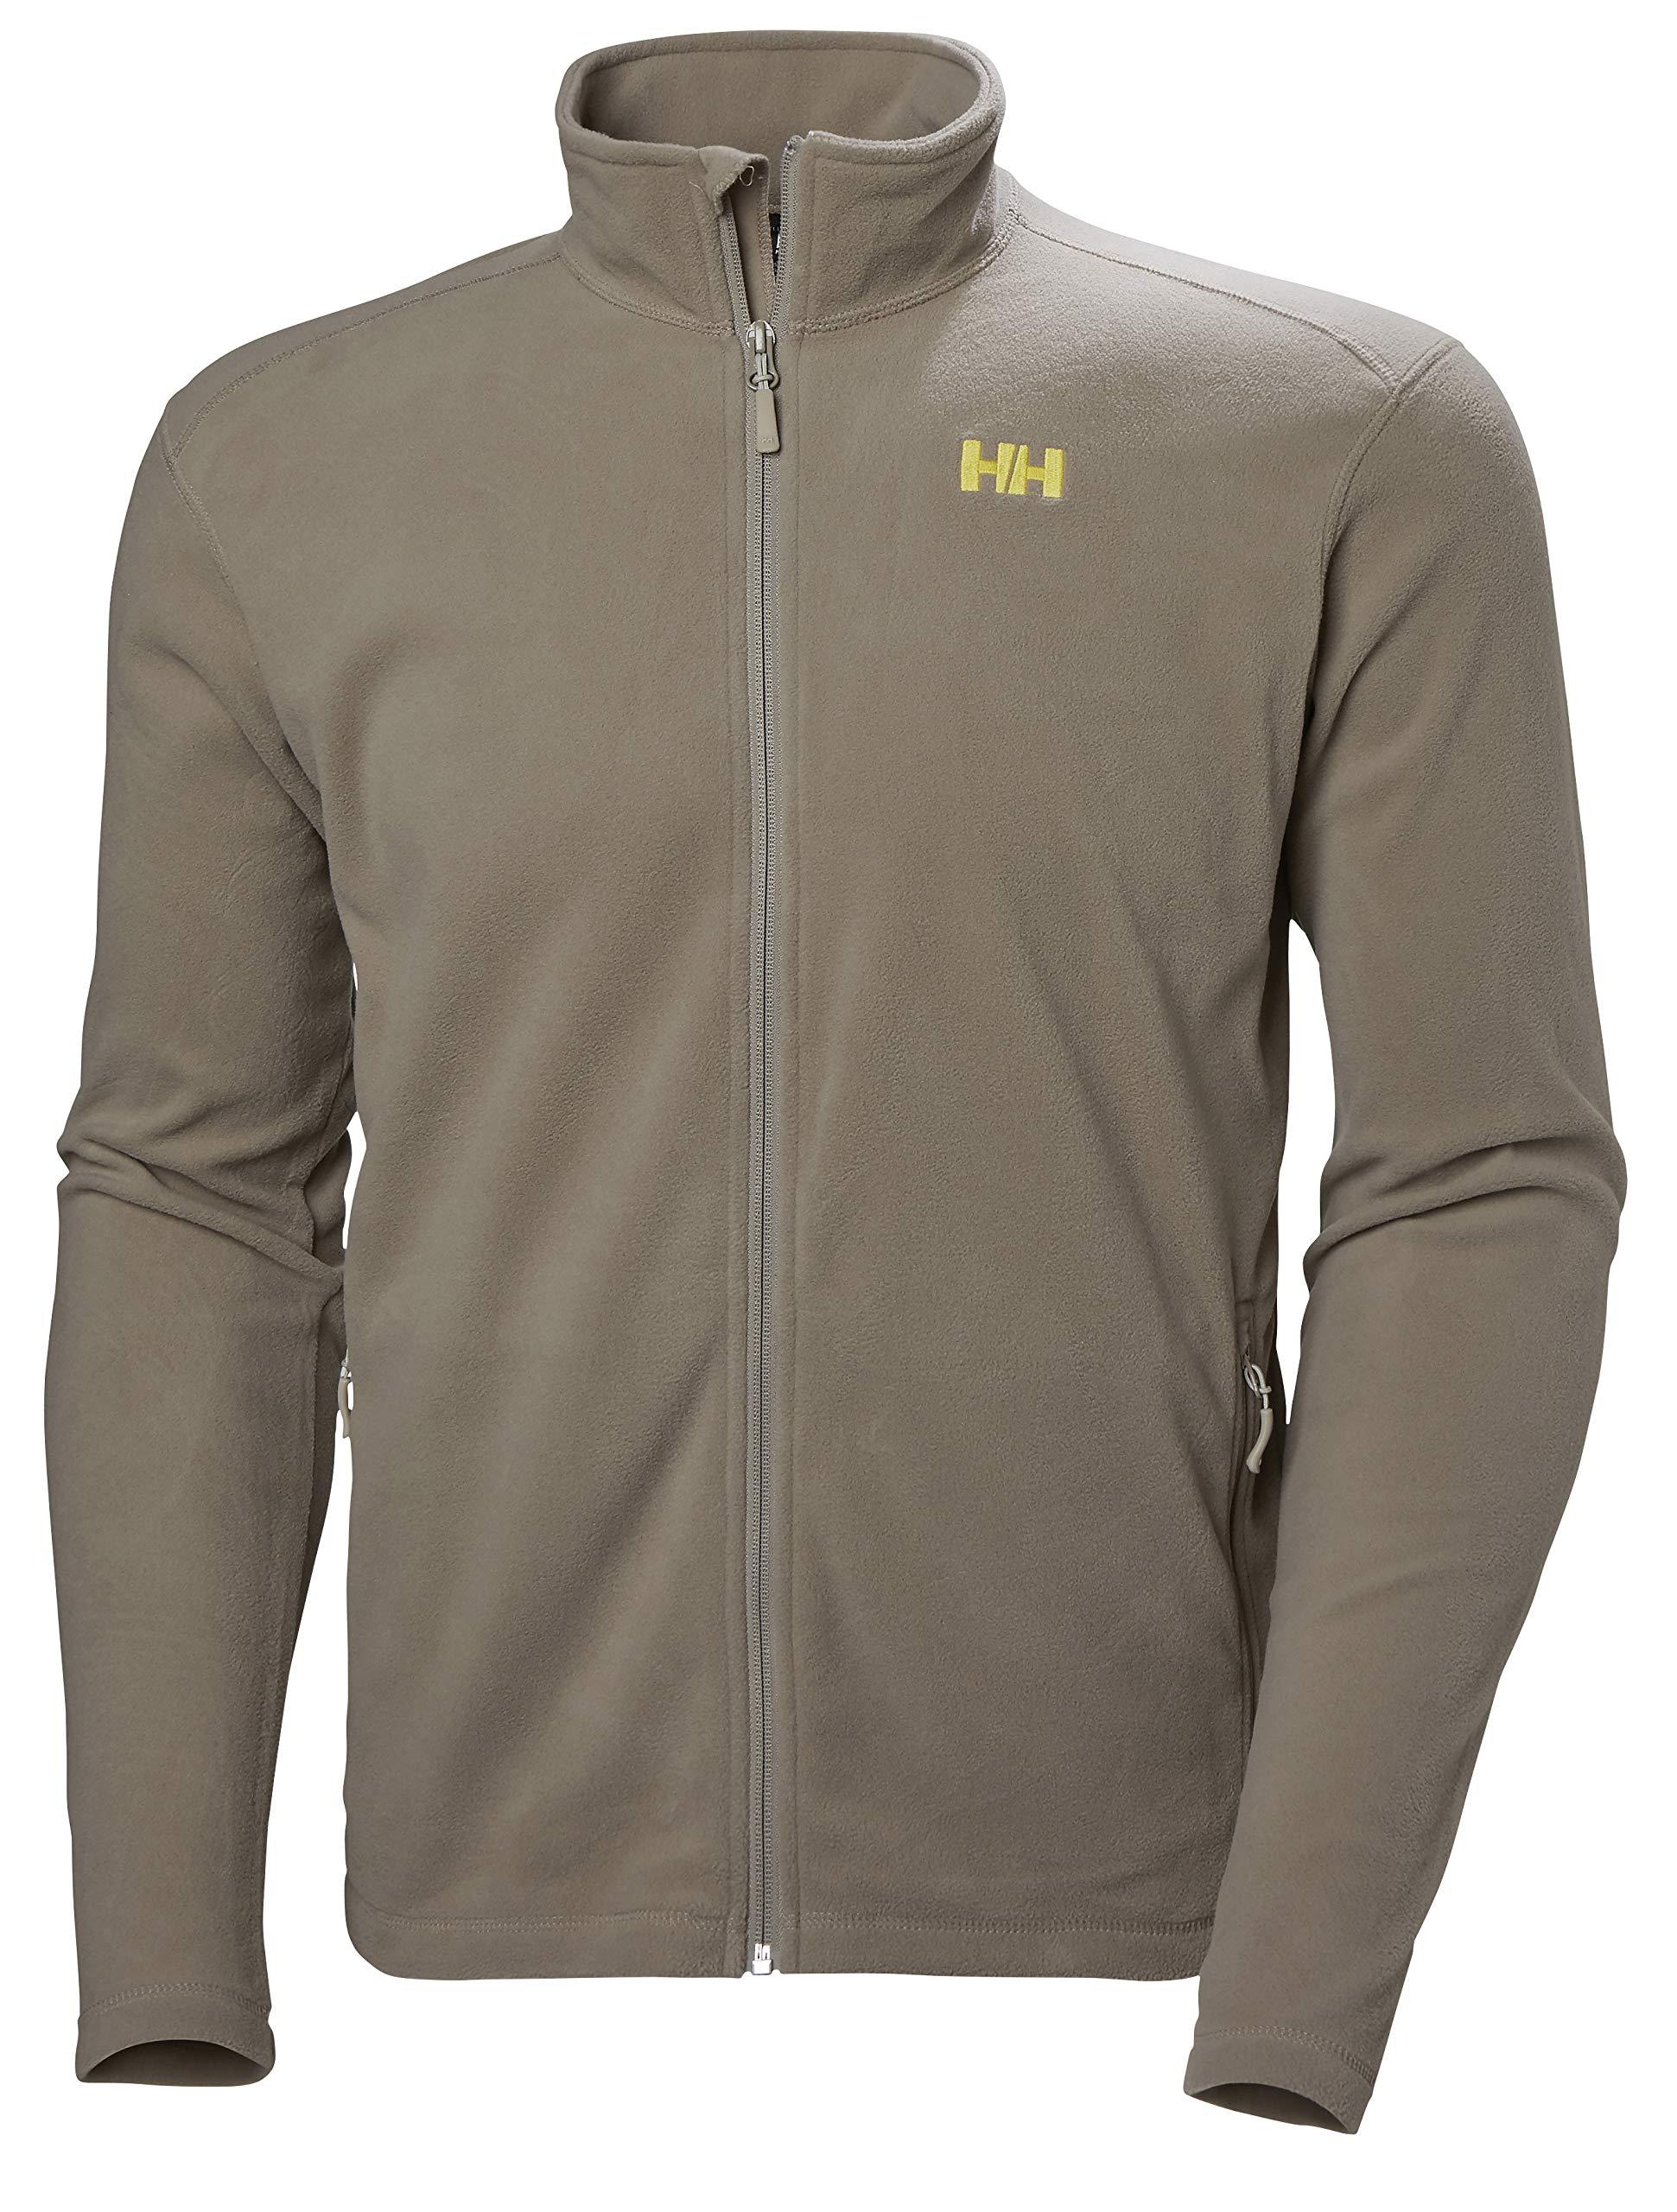 Helly Hansen Daybreaker Lightweight Full-Zip Fleece Jacket